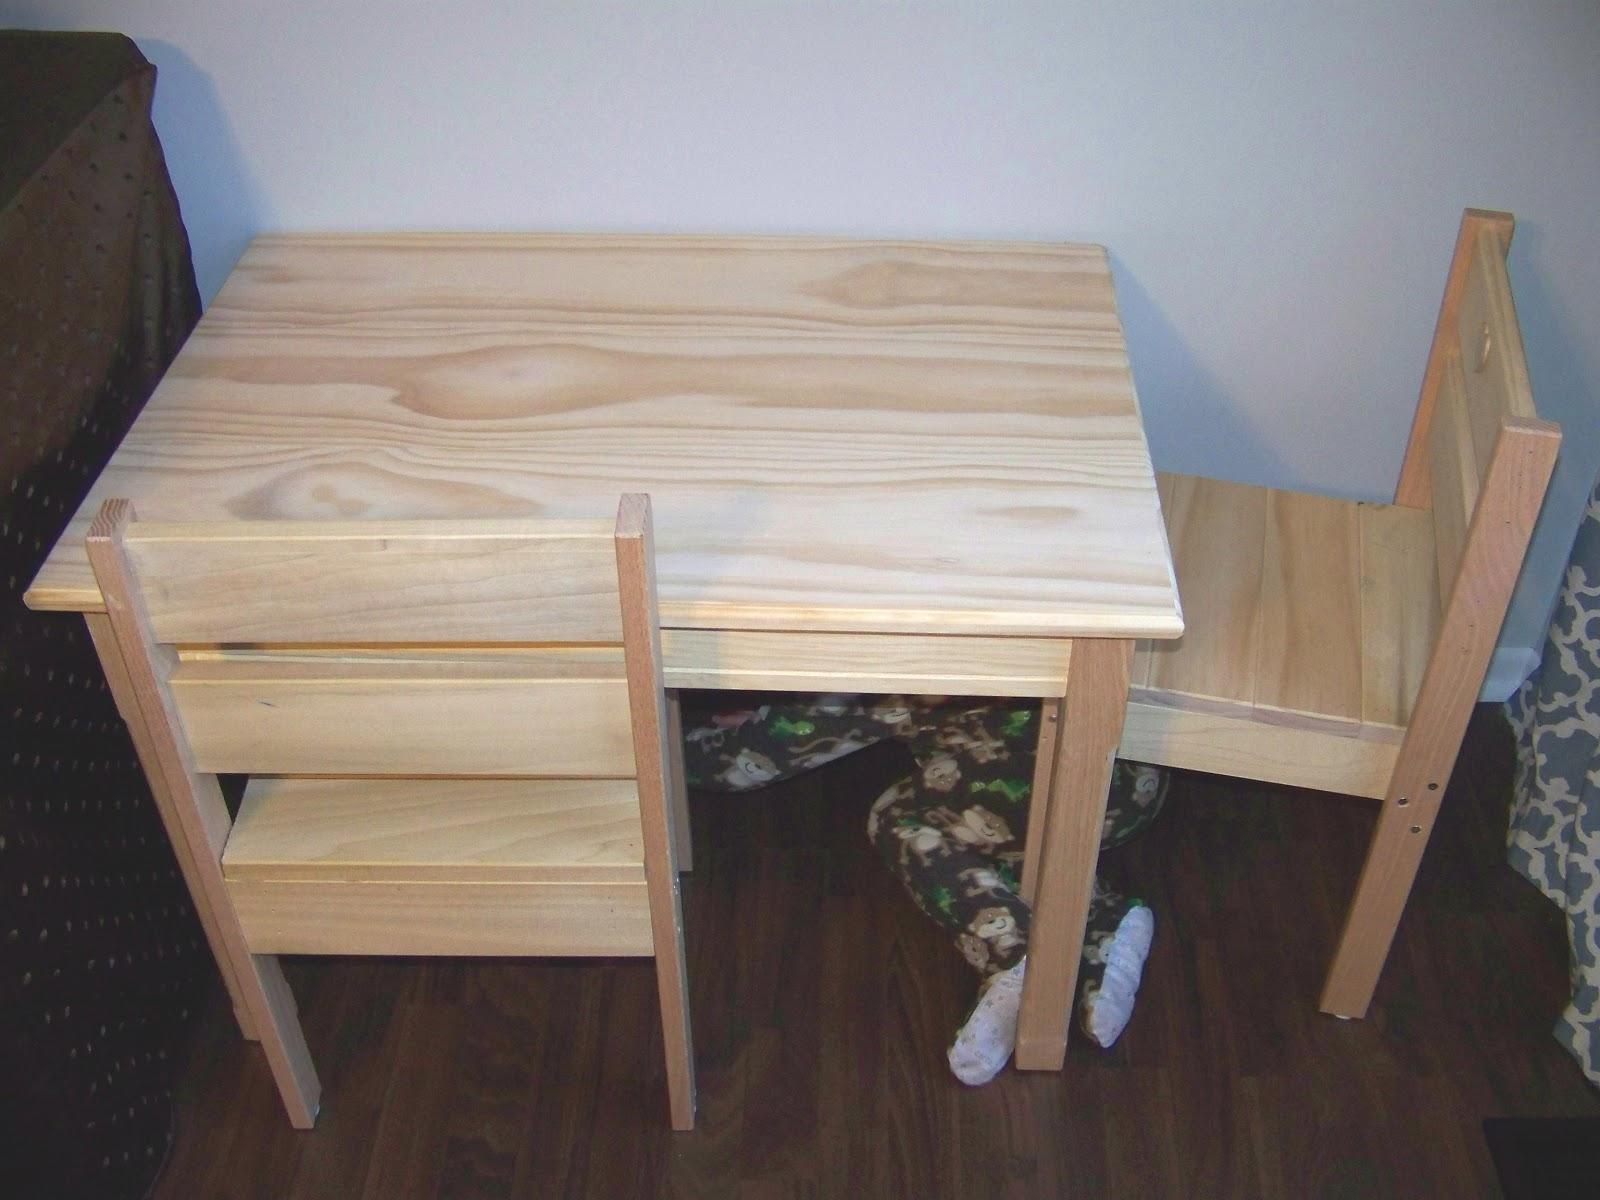 Kids Furniture Diy Plans Pdf Woodworking